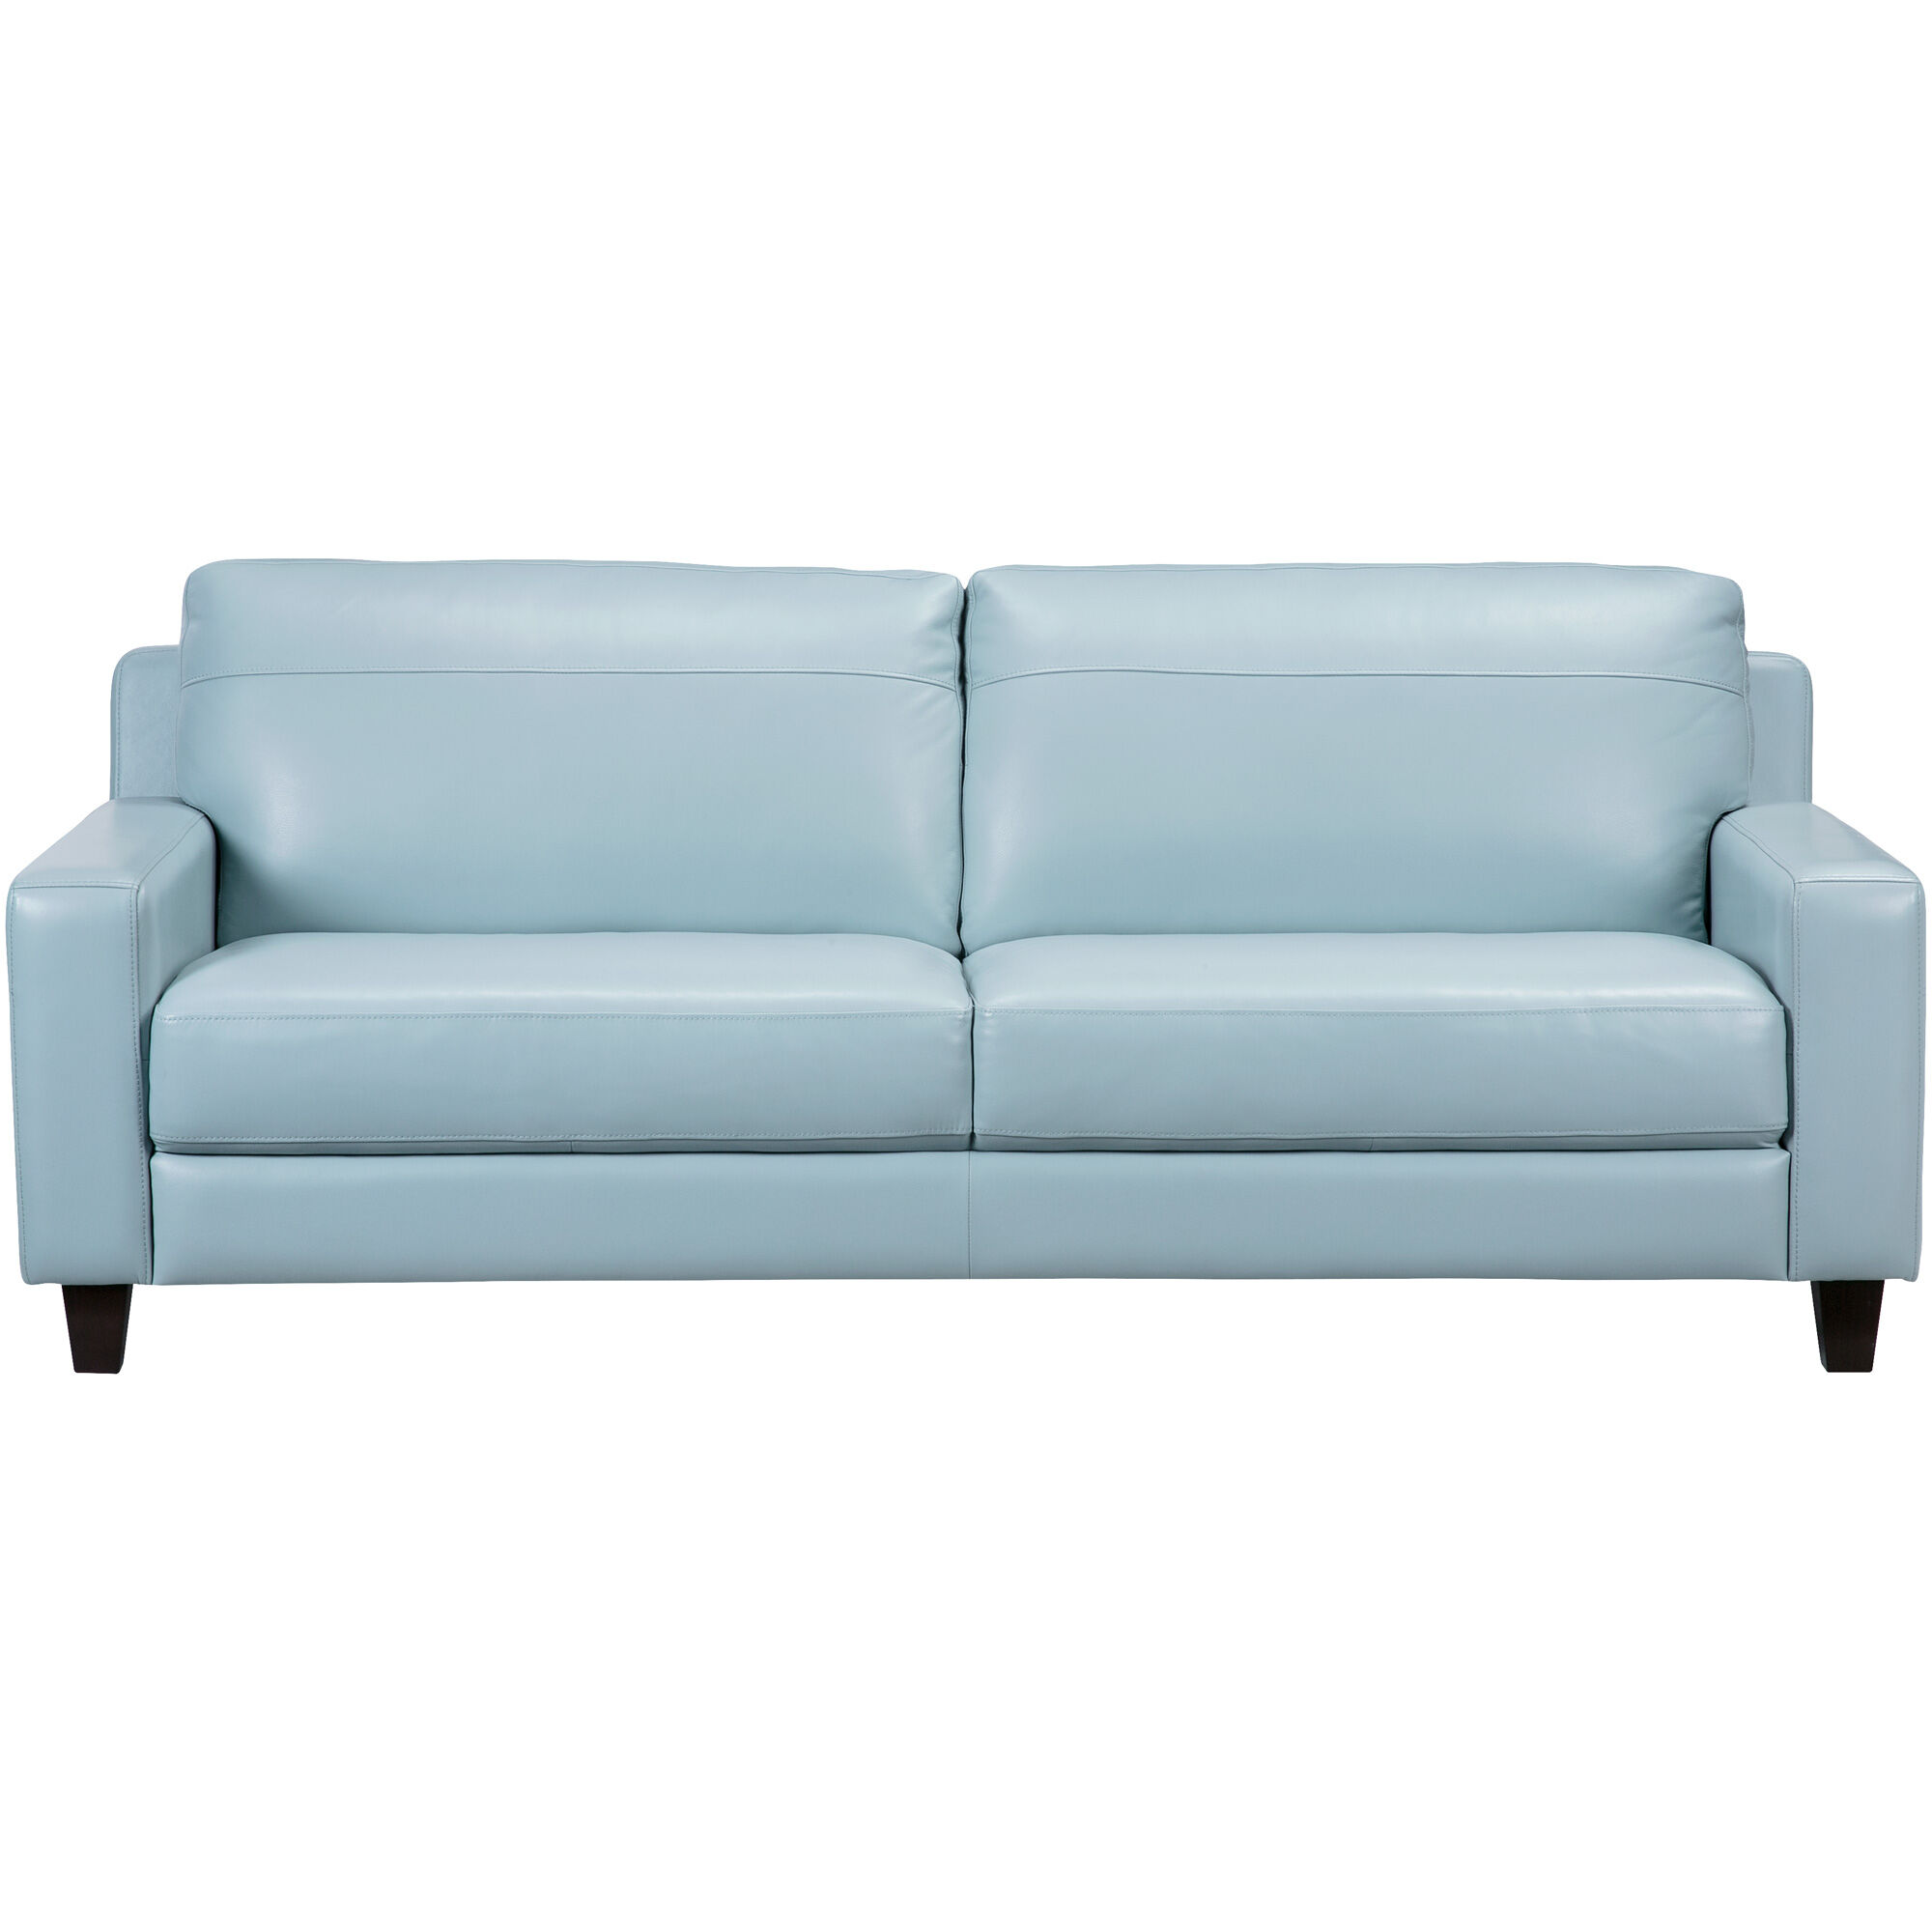 aqua sofa extra large corner beds slumberland furniture fender